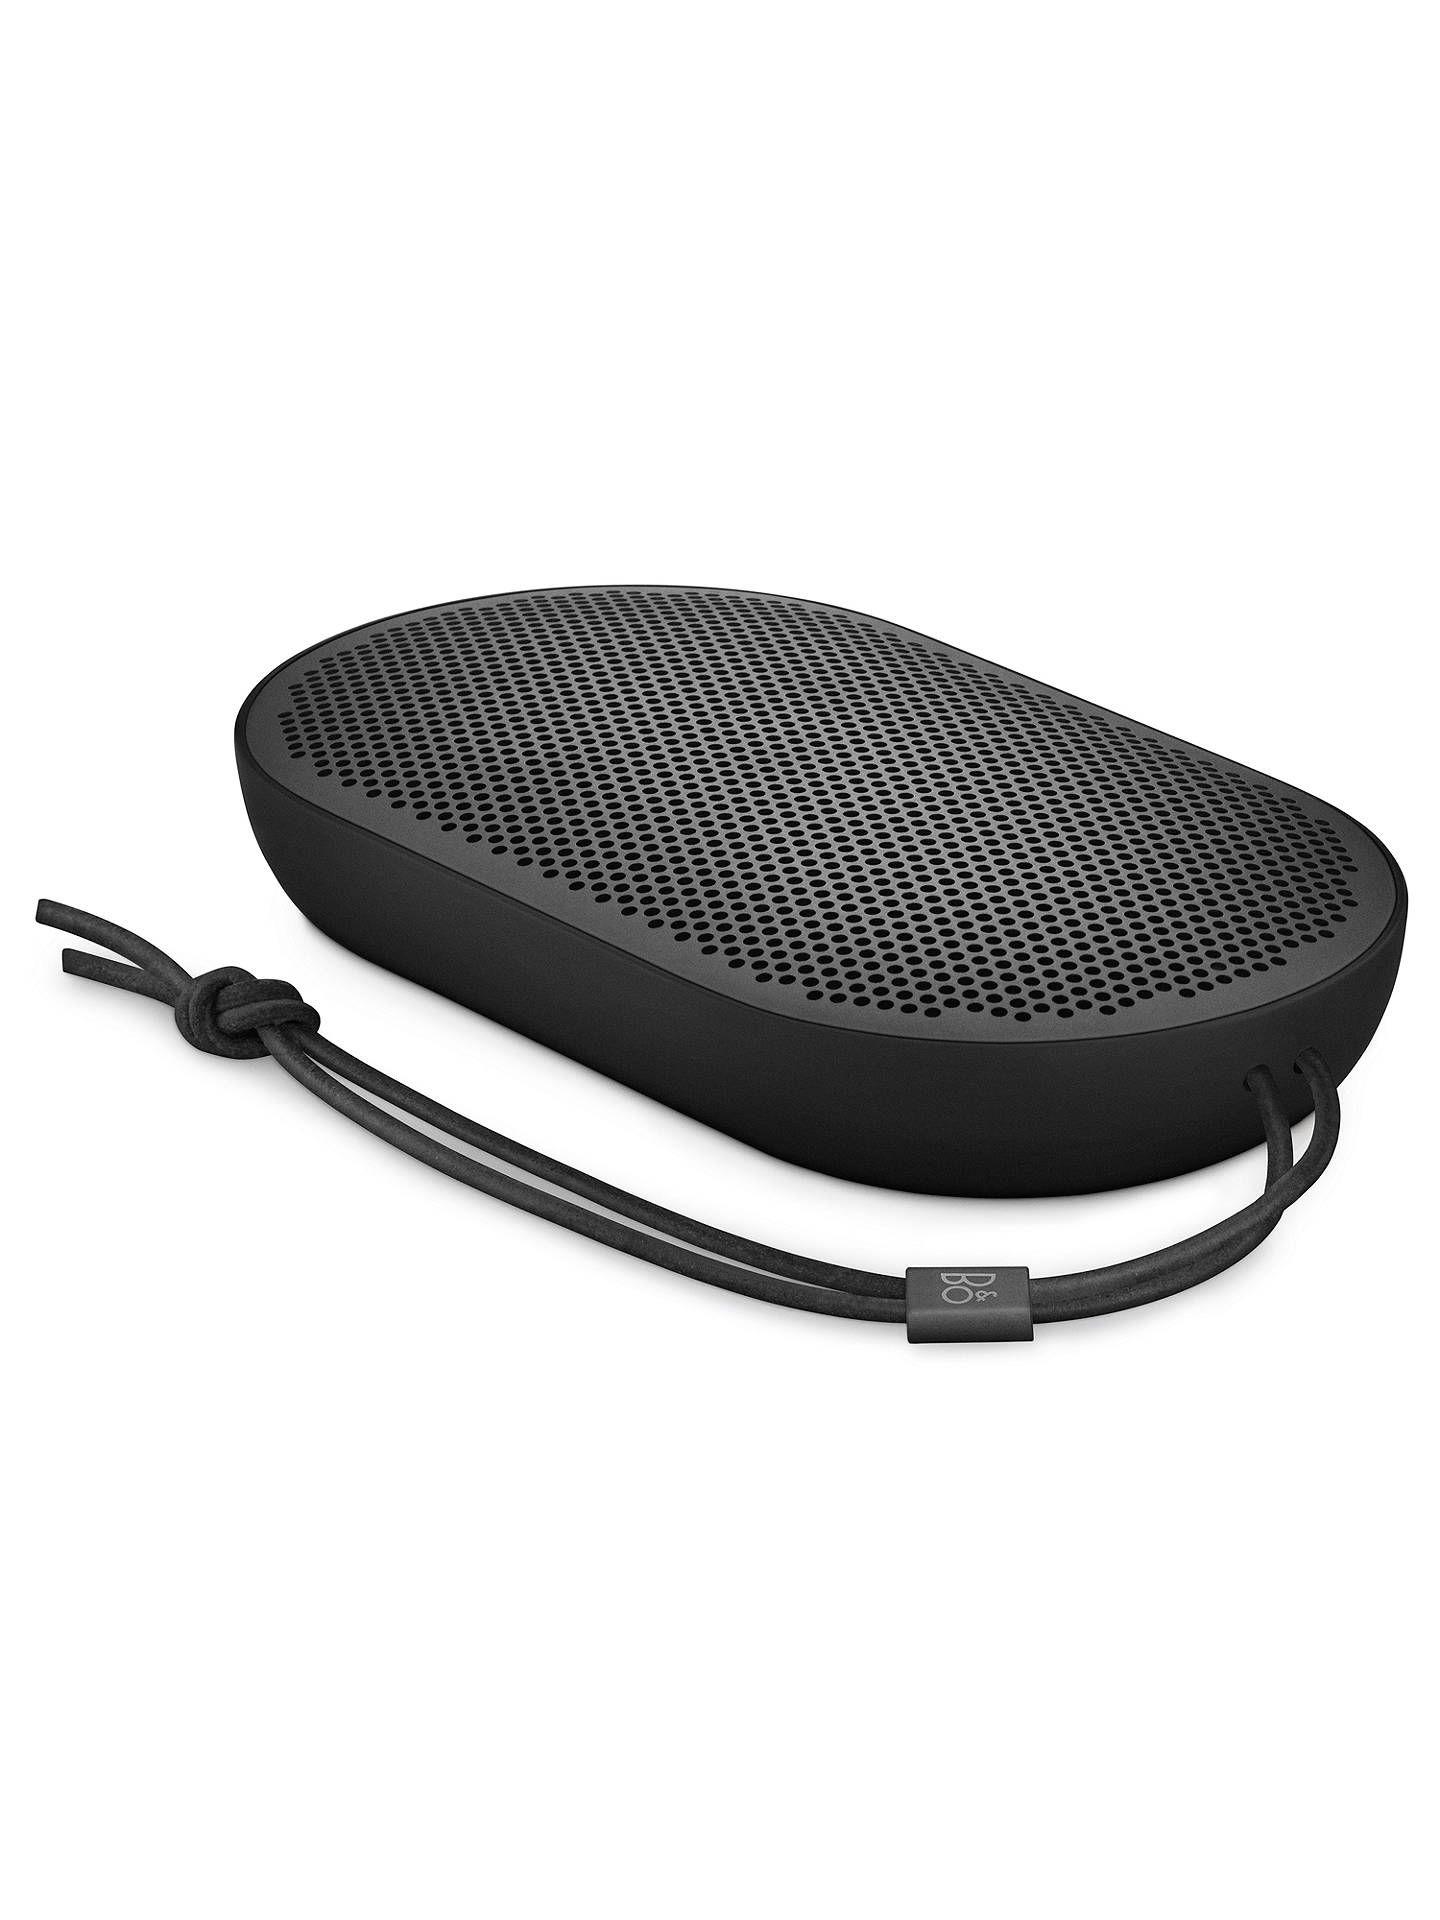 Enceinte portable Bang & Olufsen Beoplay P2 - Bluetooth